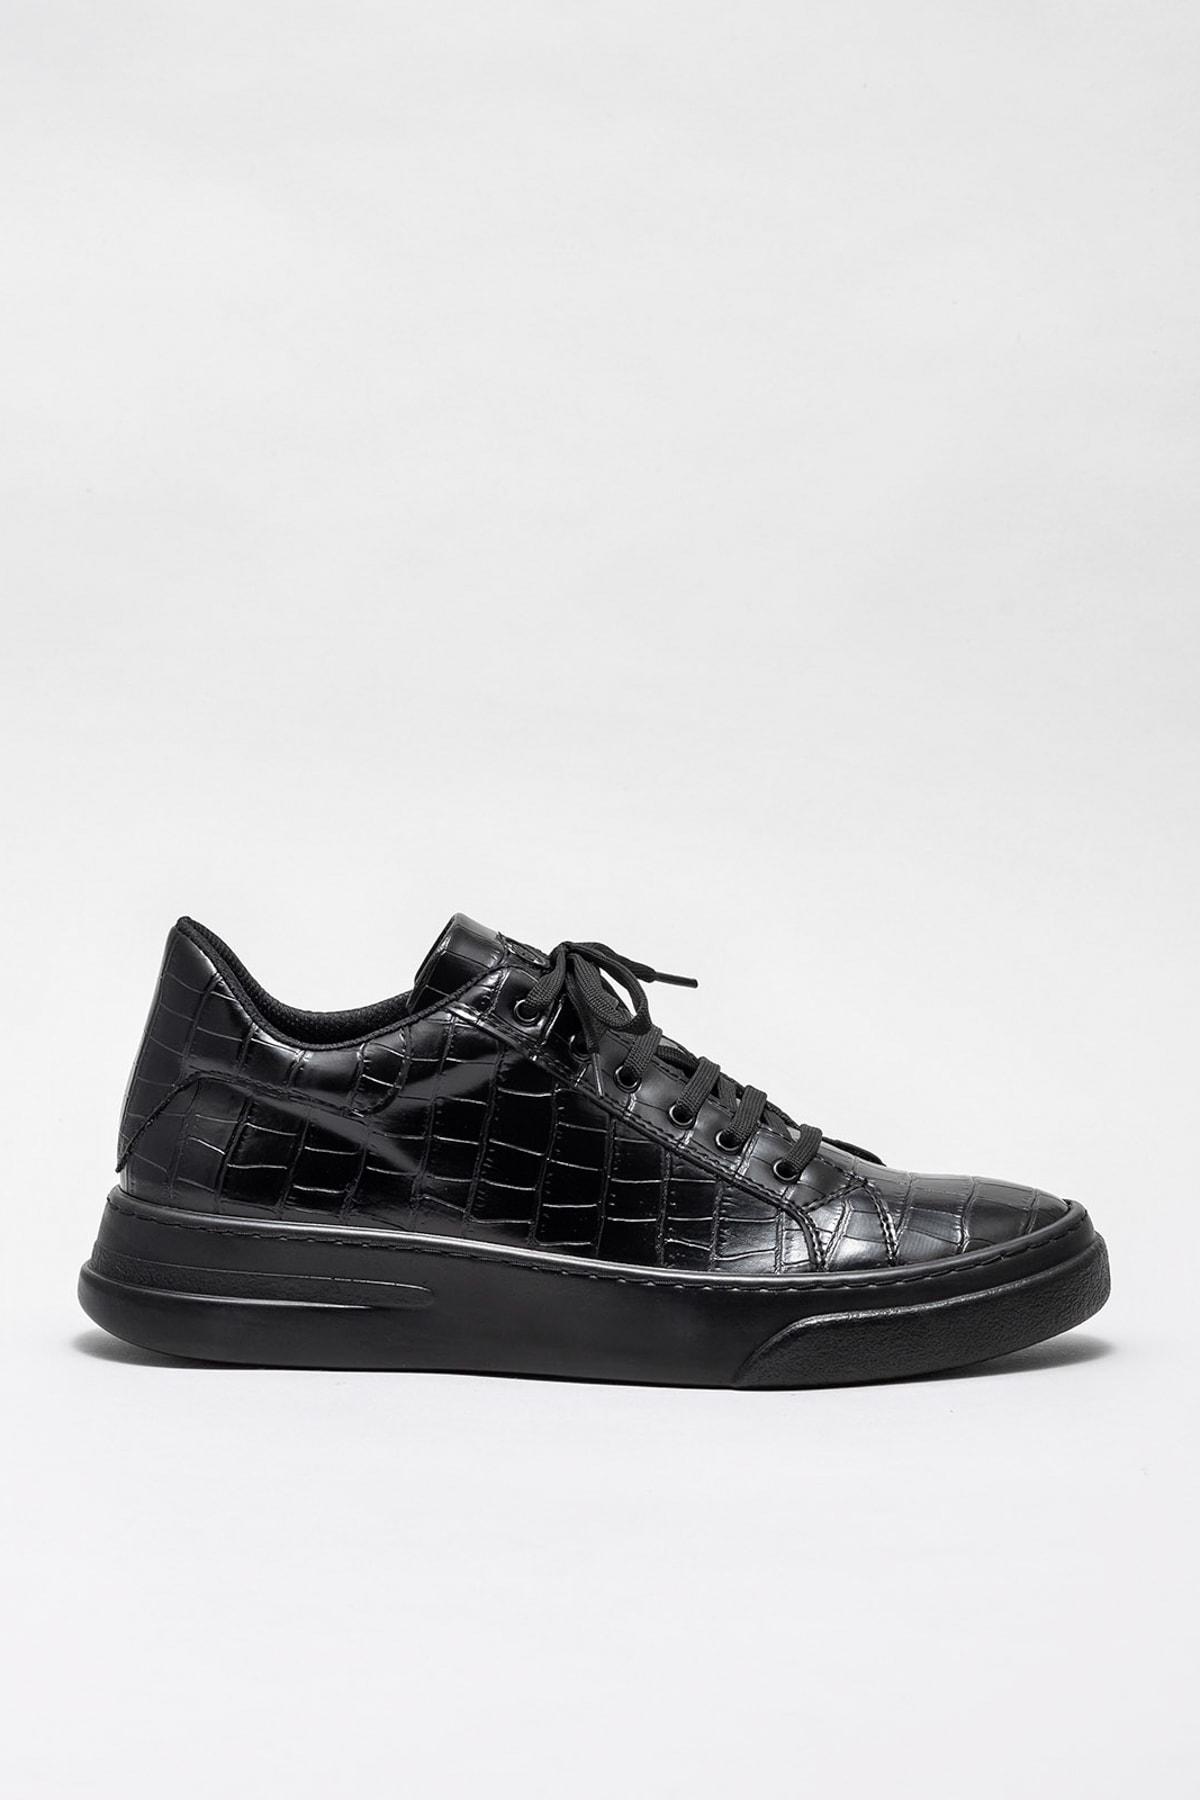 Elle Shoes Erkek Casual Ayakkabı Storm-1 20KTA828-2 1